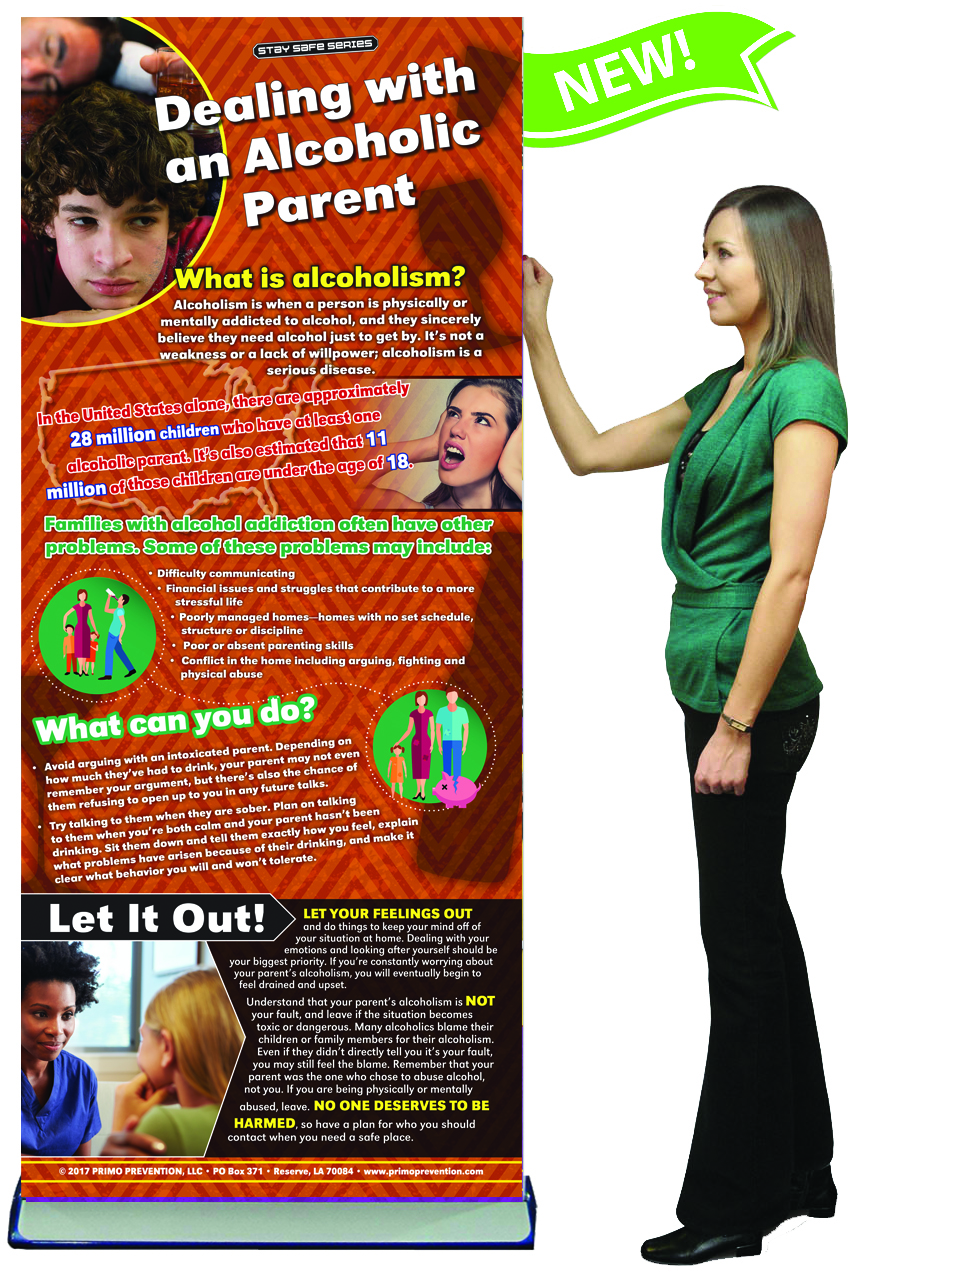 alcoholic-parent-banner-girl